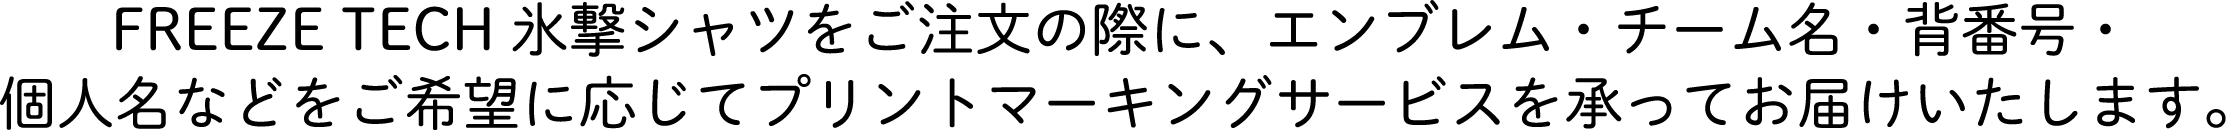 FREEZE TECH 氷撃シャツをご注文の際に、エンブレム・チーム名・背番号・個人名などをご希望に応じてプリントマーキングサービスを承ってお届けいたします。